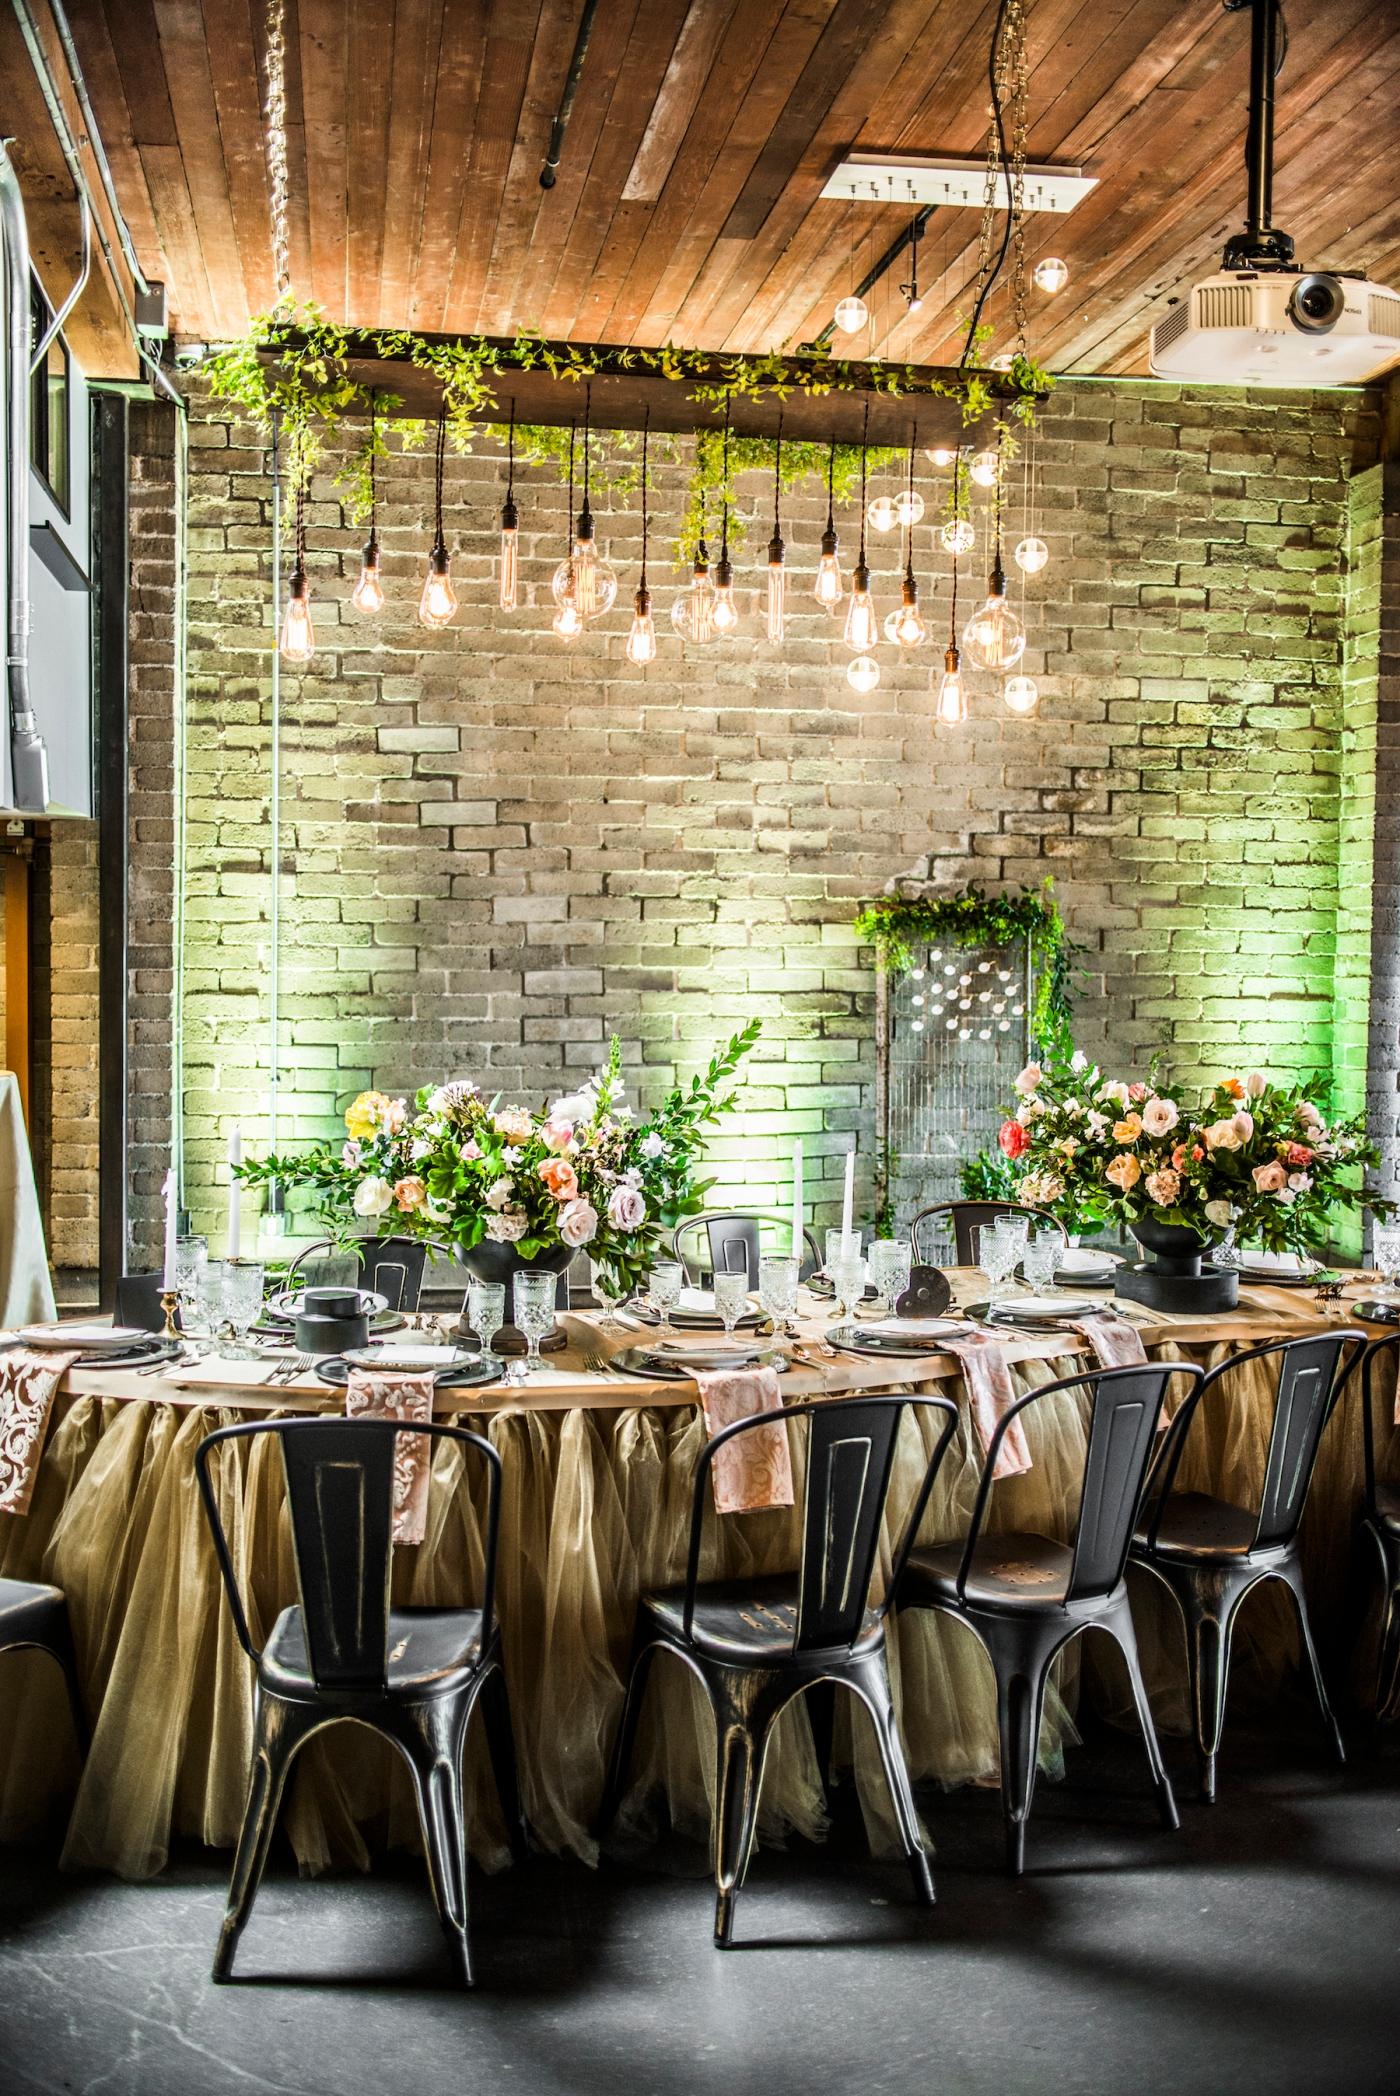 photography_by_jane_speleers_2017_wedding_show_i_do_sodo_within_designed_by_melody_davisdsc_0314